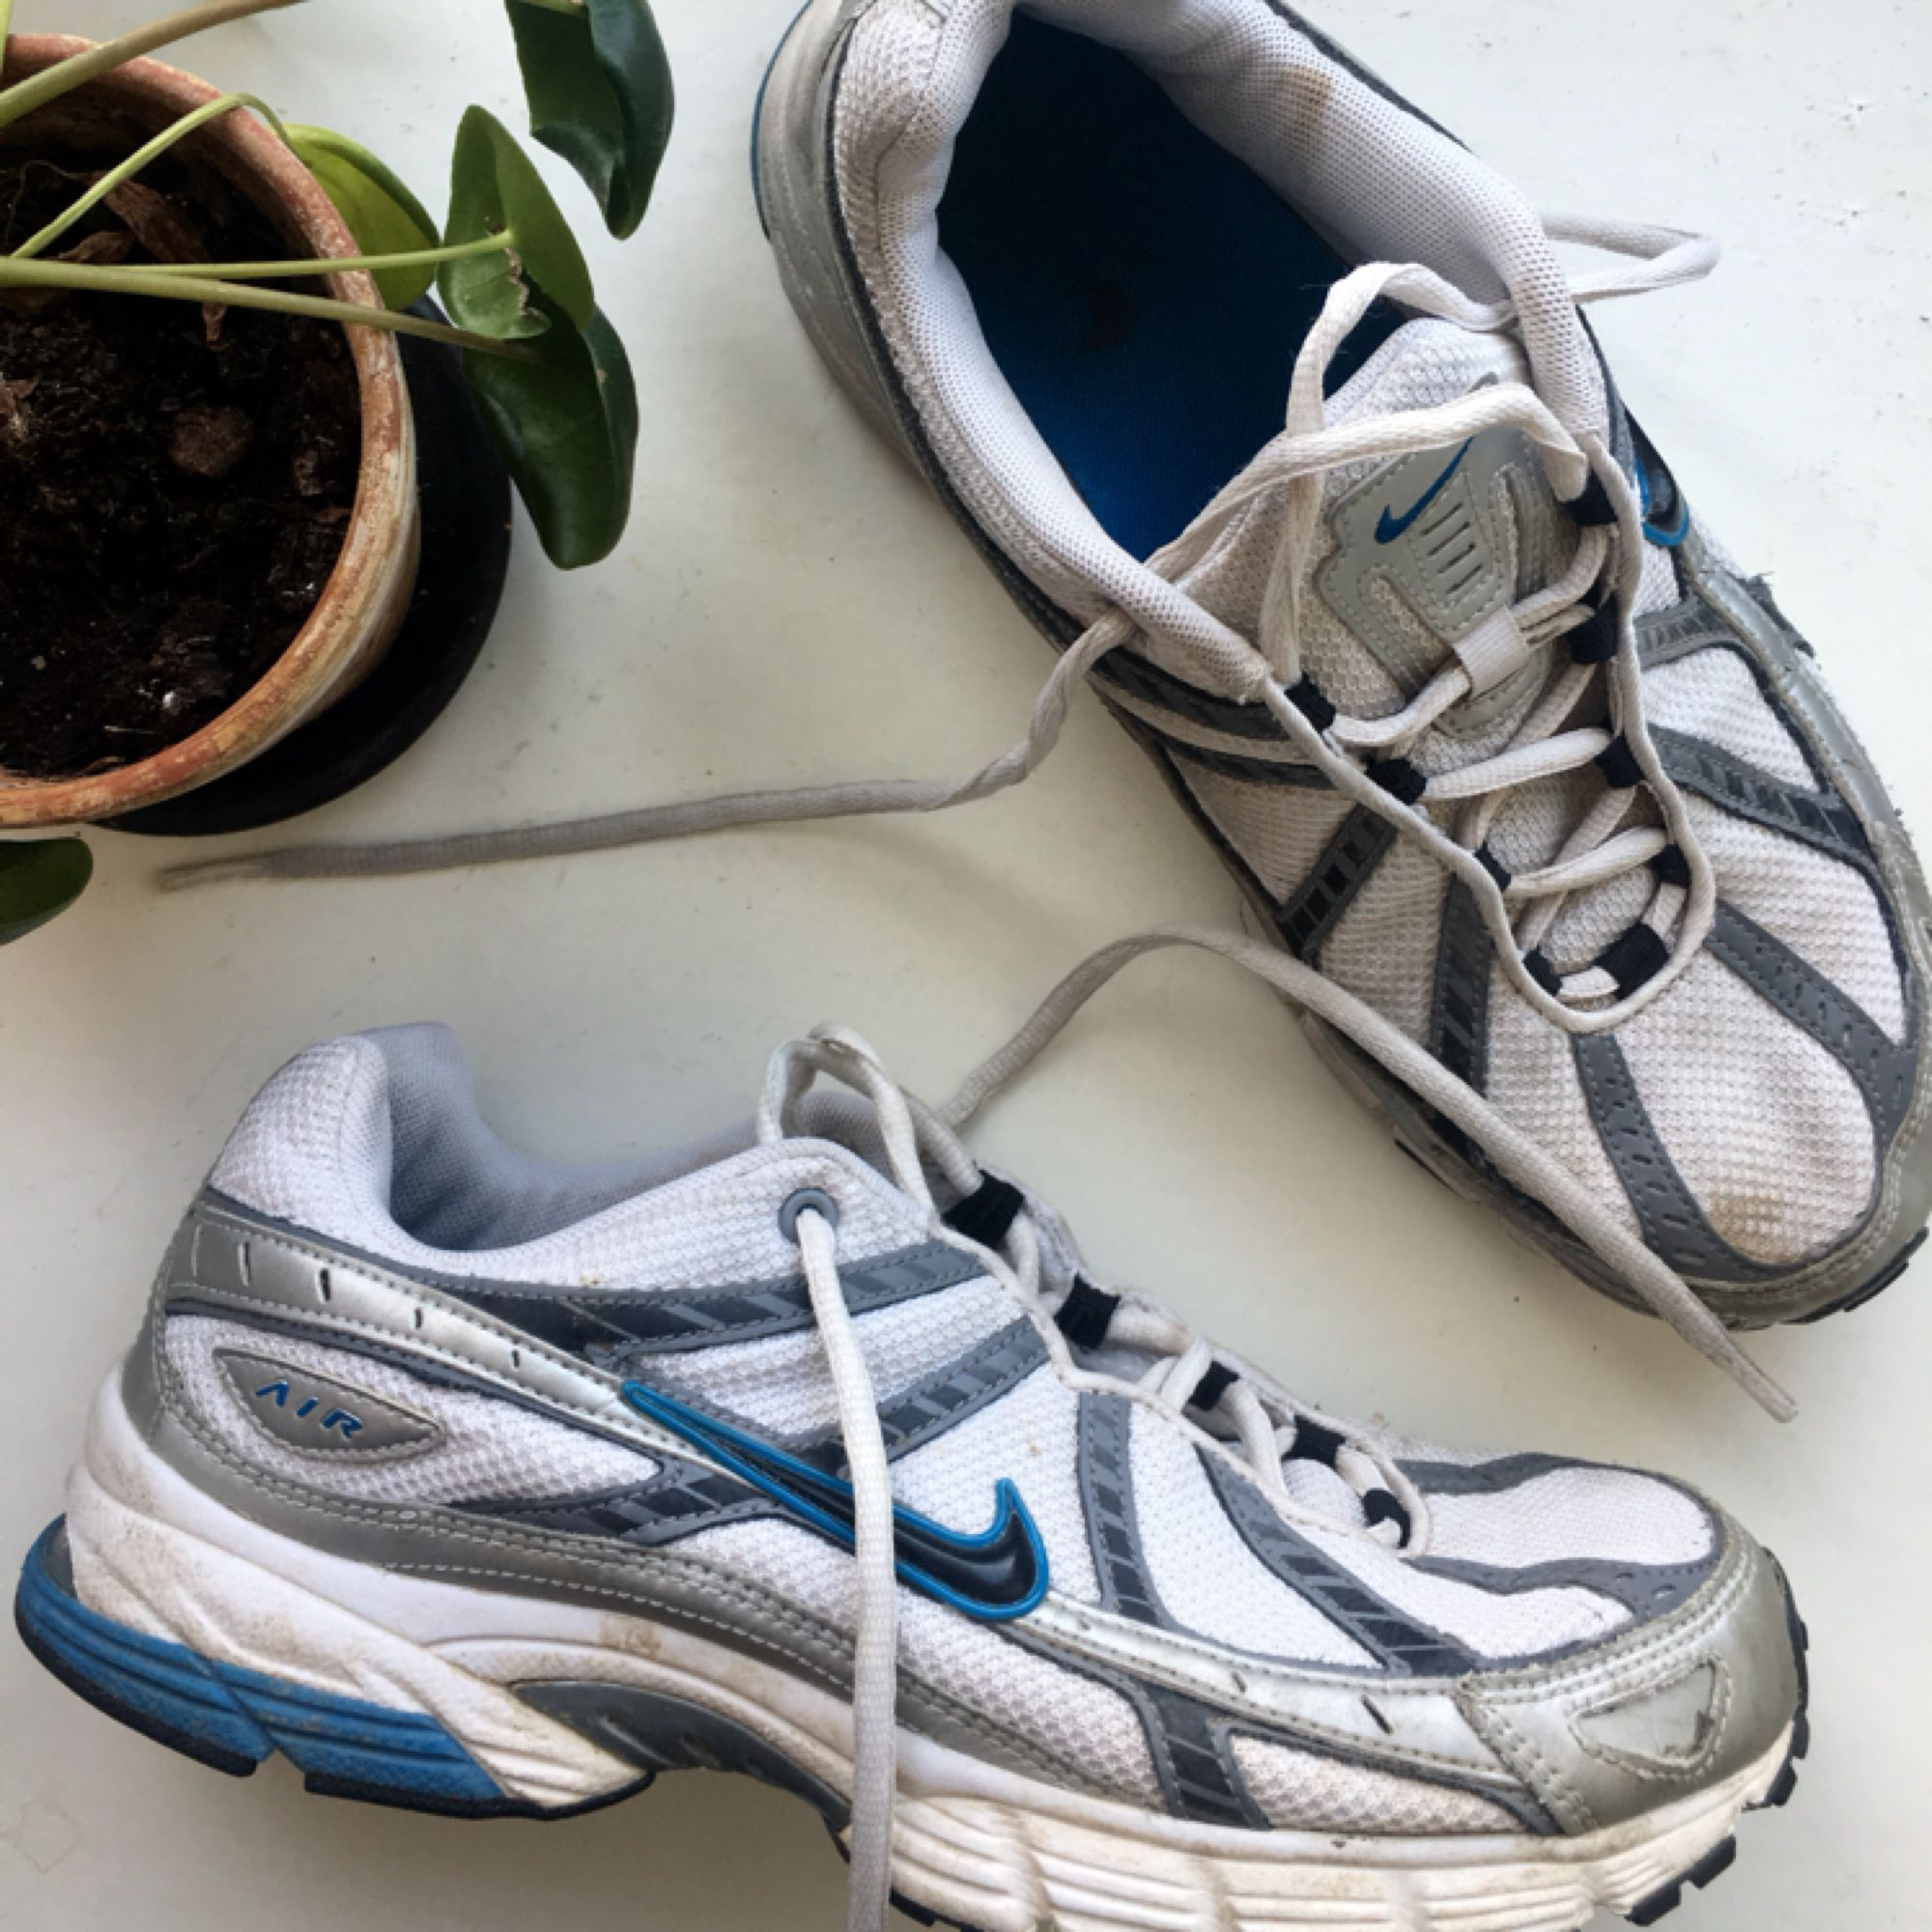 new style d887c 8348e Vitablåa sneakers från Nike. Storlek 41. I fint, begagnat skick.